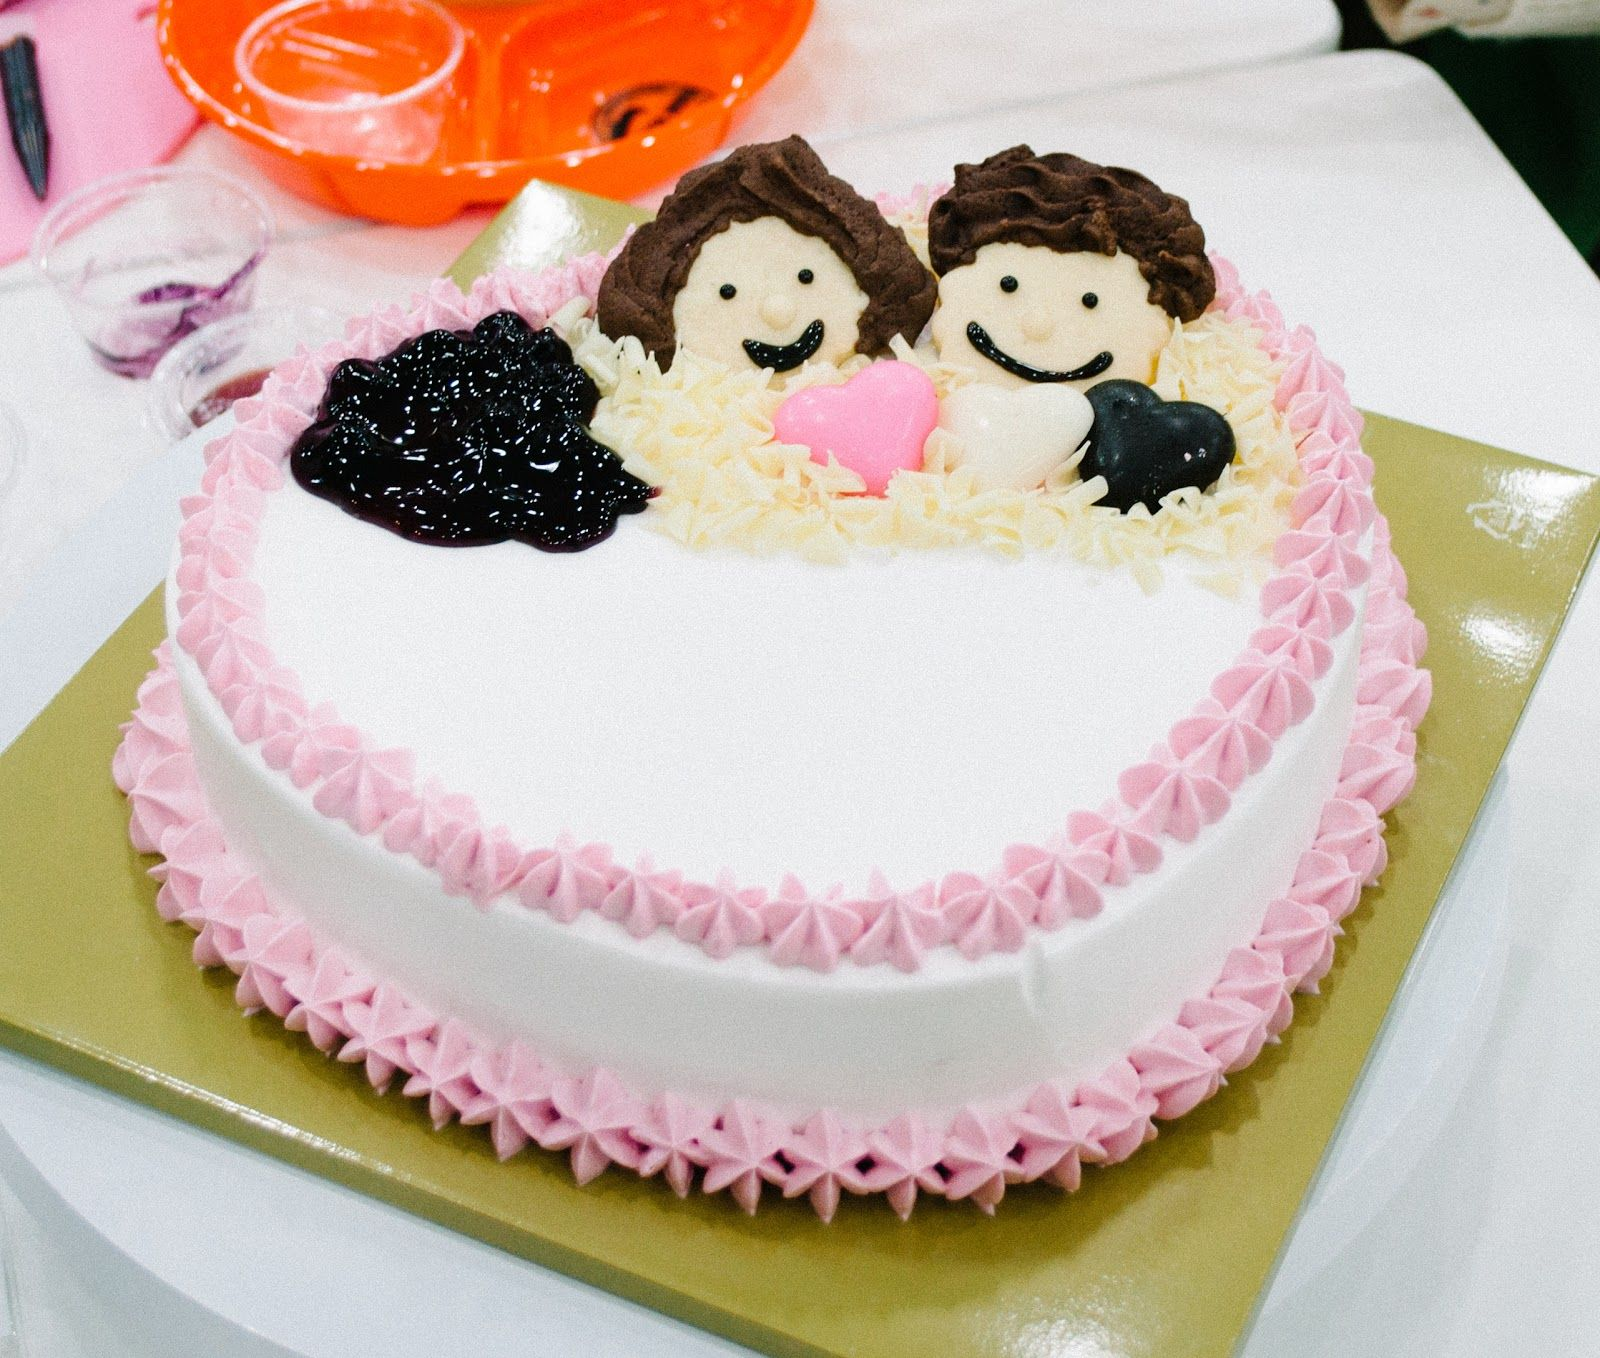 Wedding Anniversary Cakes Designs - Vodagent.com | Cakes | Pinterest ...